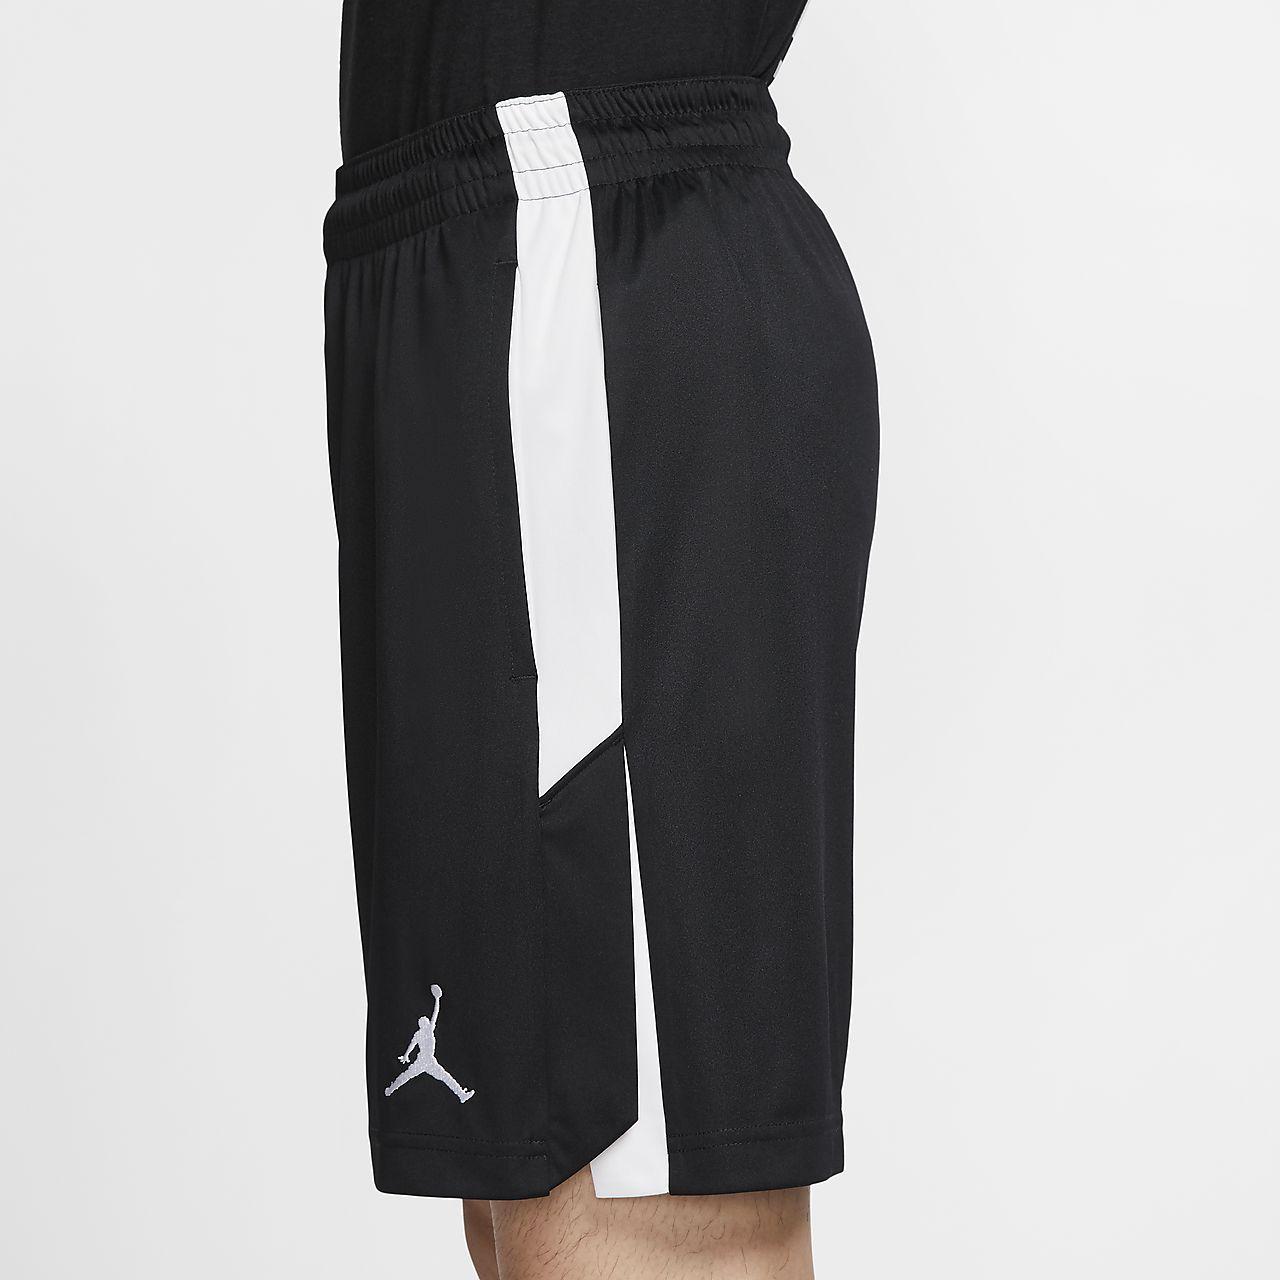 Jordan Dri-FIT 23 Alpha Men s Training Shorts. Nike.com DK 19b1856798b4